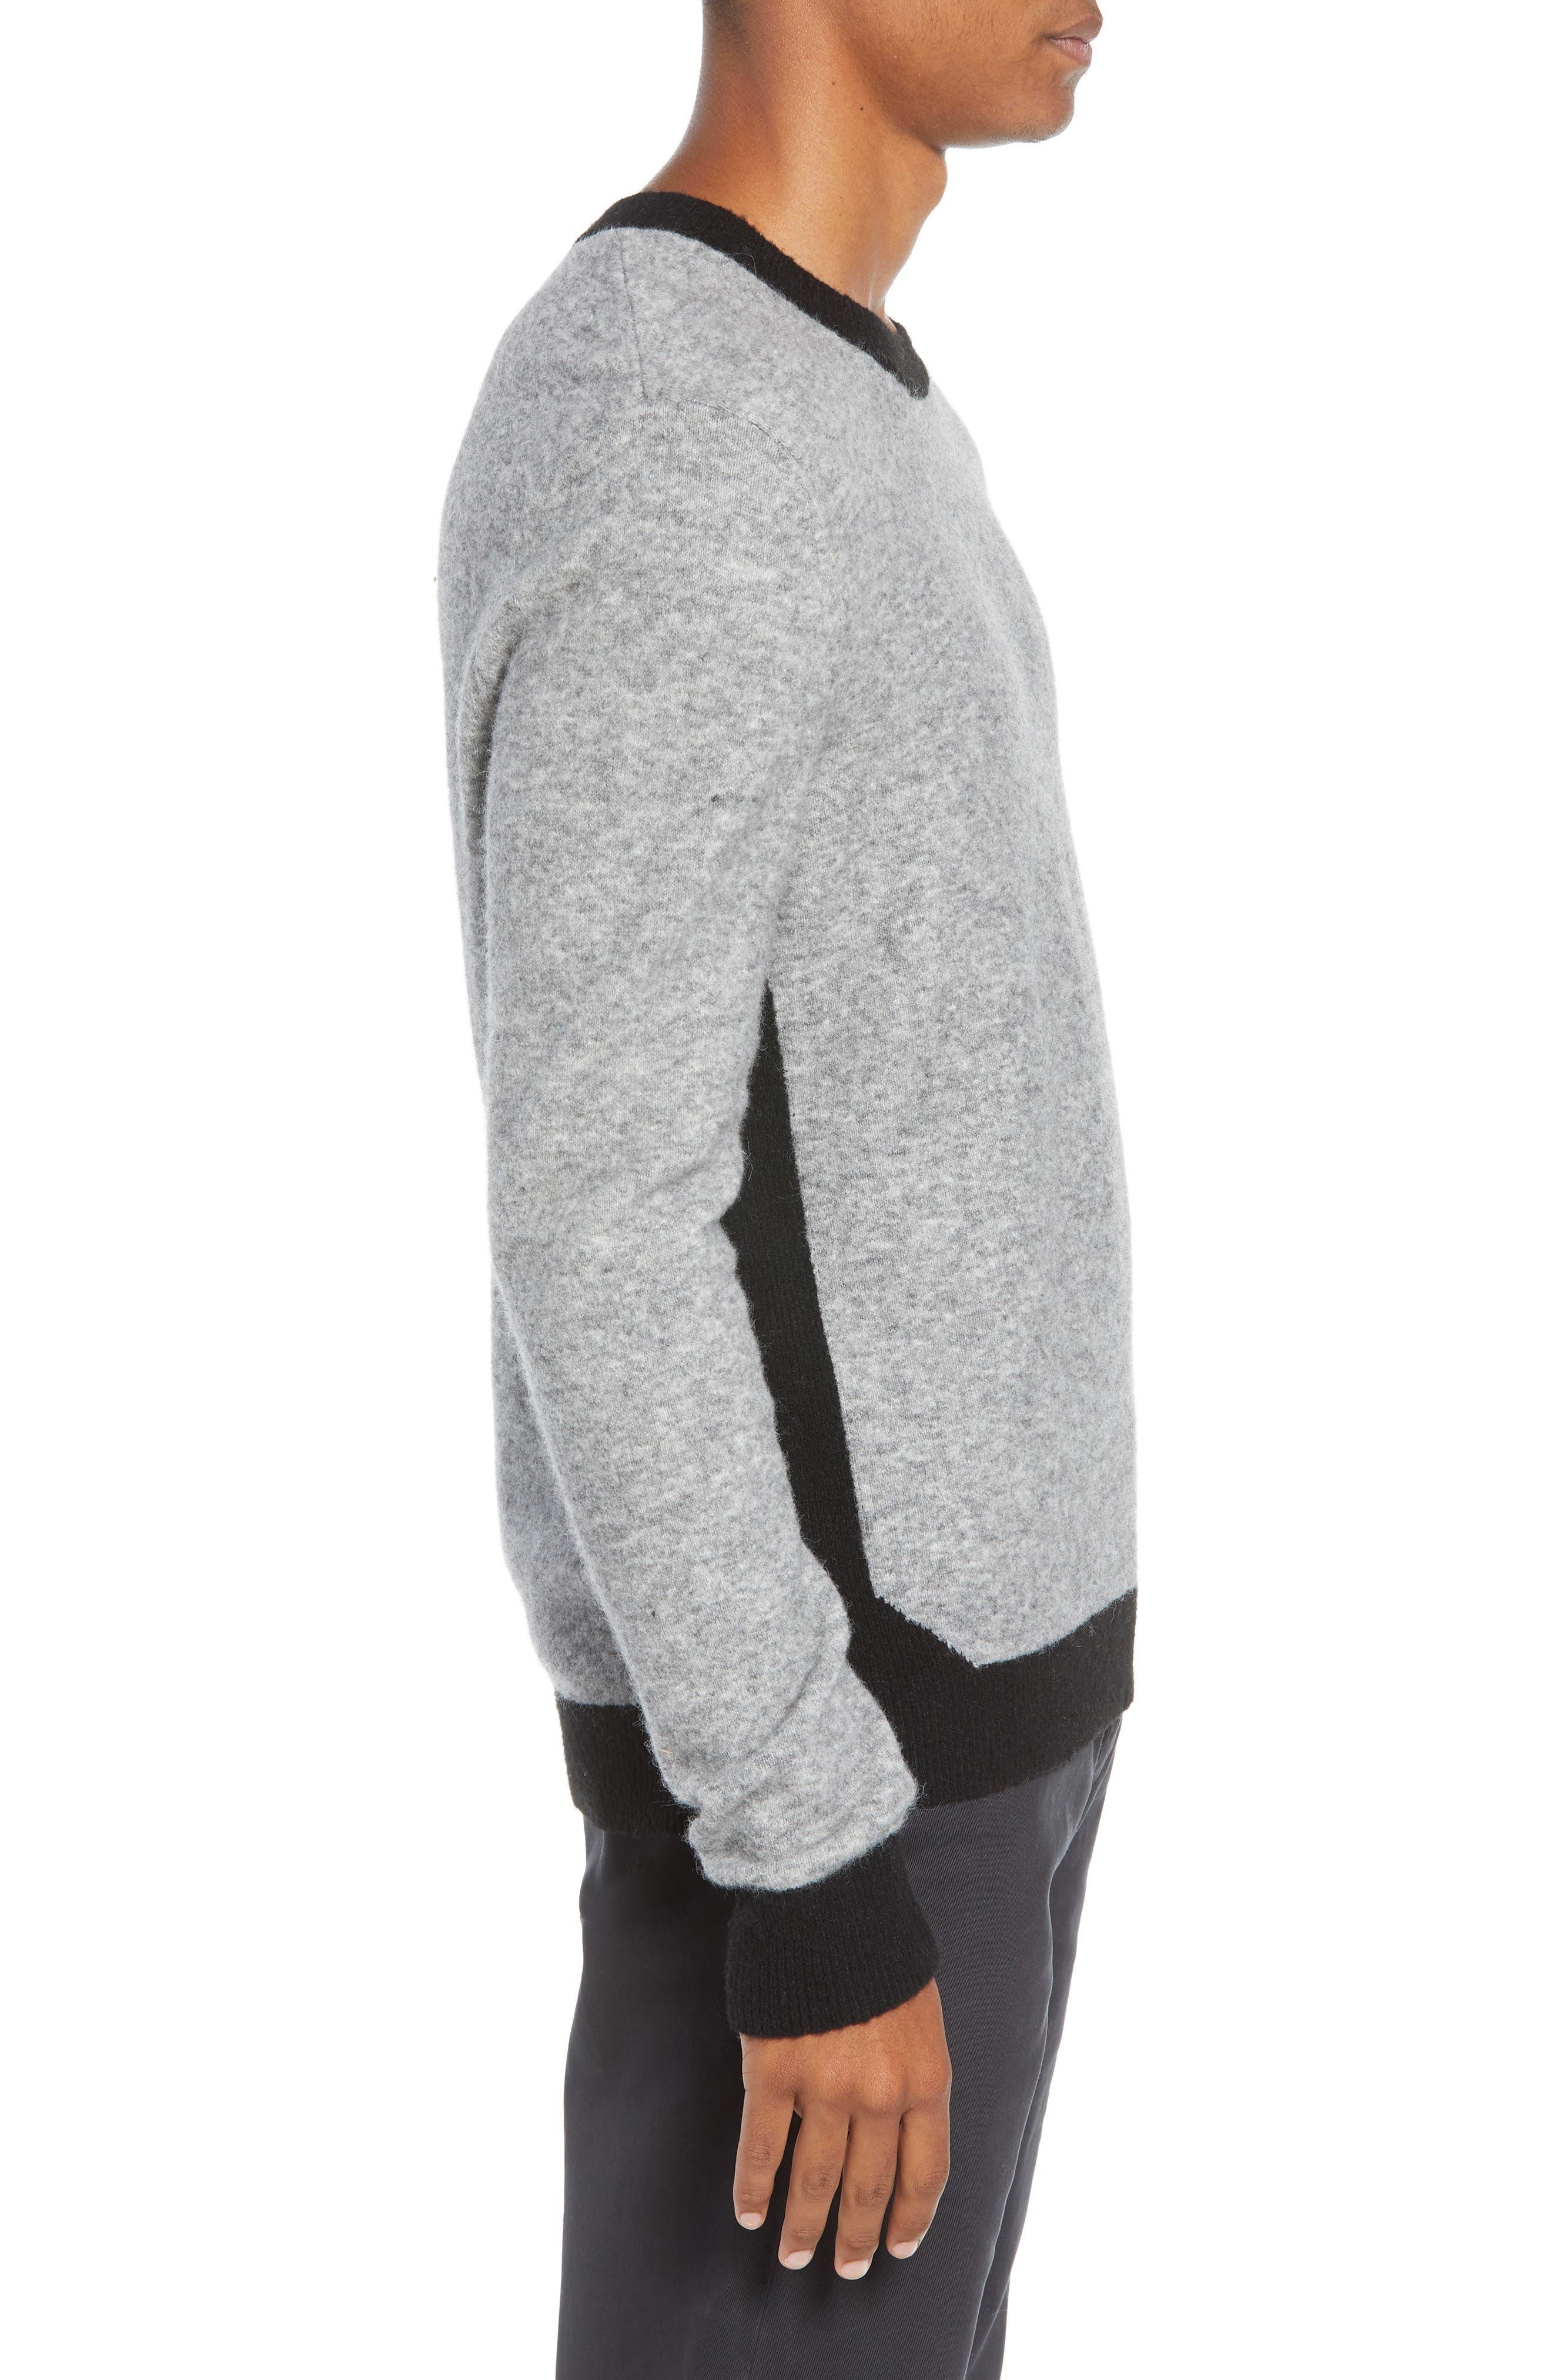 Clermont Slim Fit Crewneck Sweater,                             Alternate thumbnail 3, color,                             LIGHT HEATHER GREY